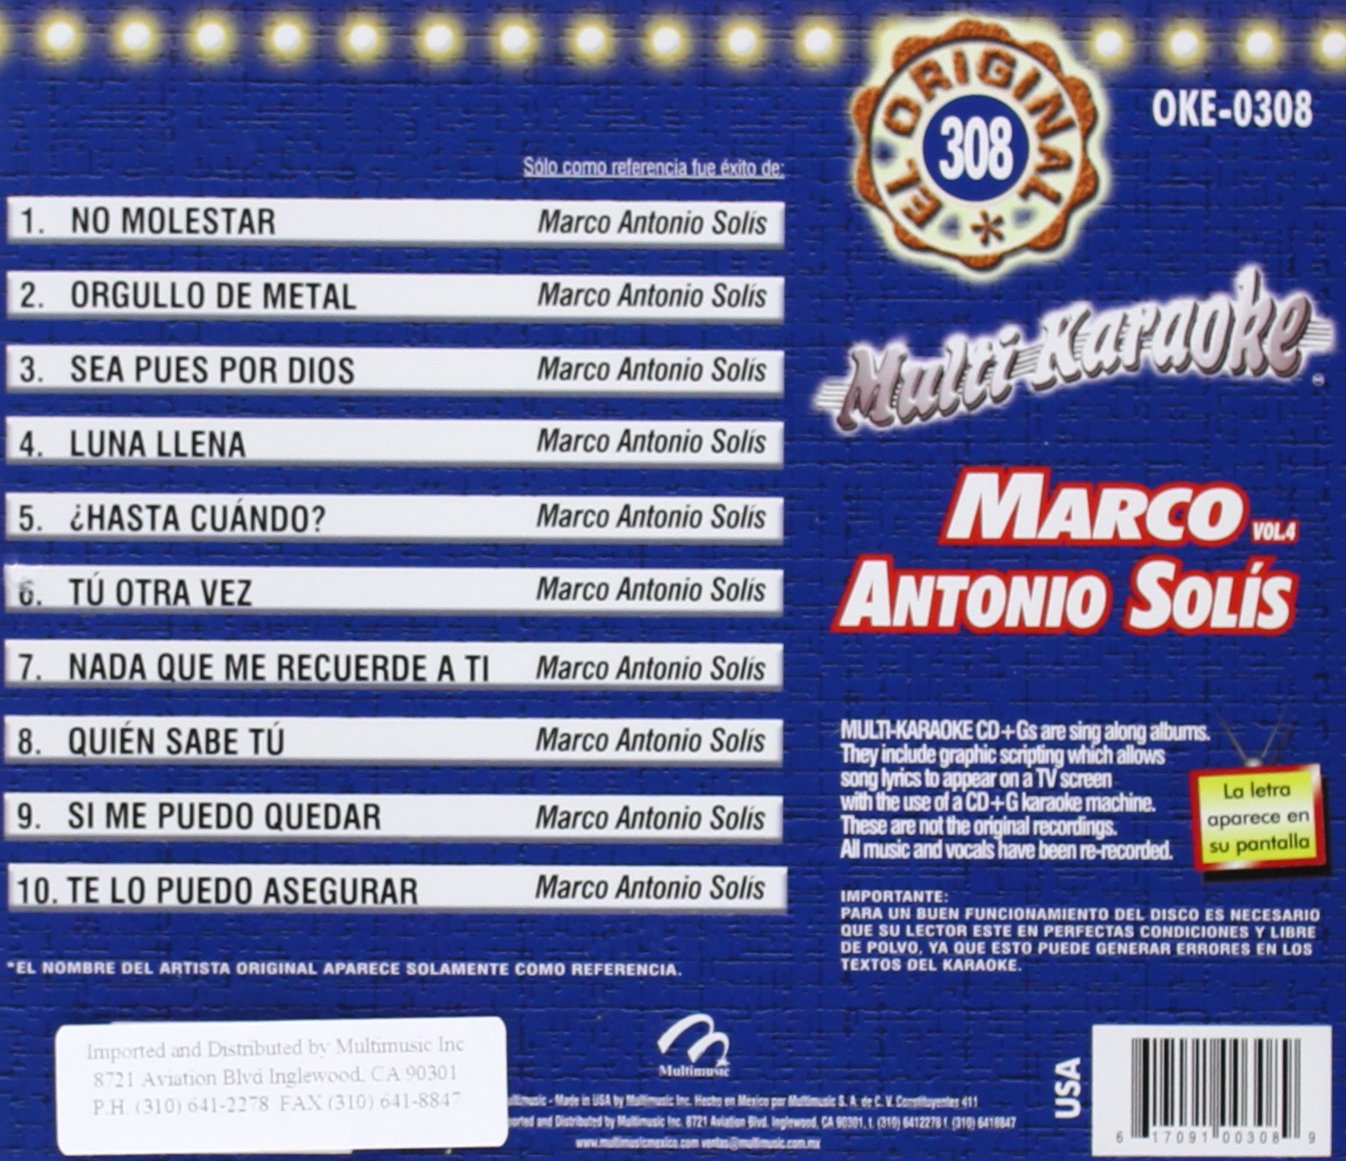 Marco Antonio Solis - Karaoke: Marco Antonio Solis 4 - Amazon.com Music